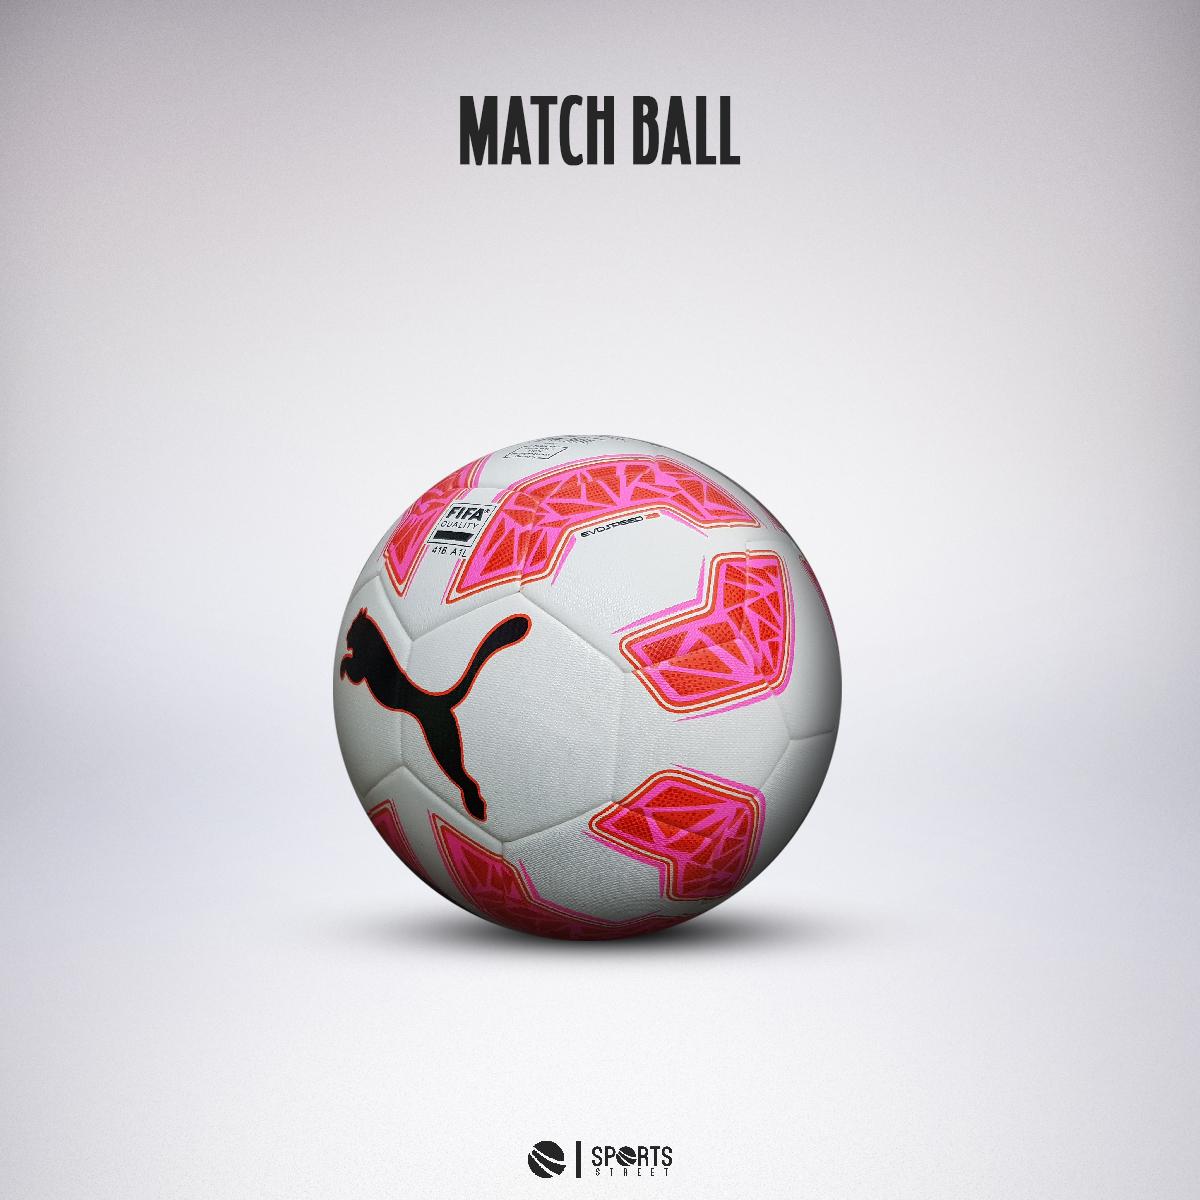 8592c99e60cc ... Puma EvoSpeed 2.5 Match Ball White Pink ...